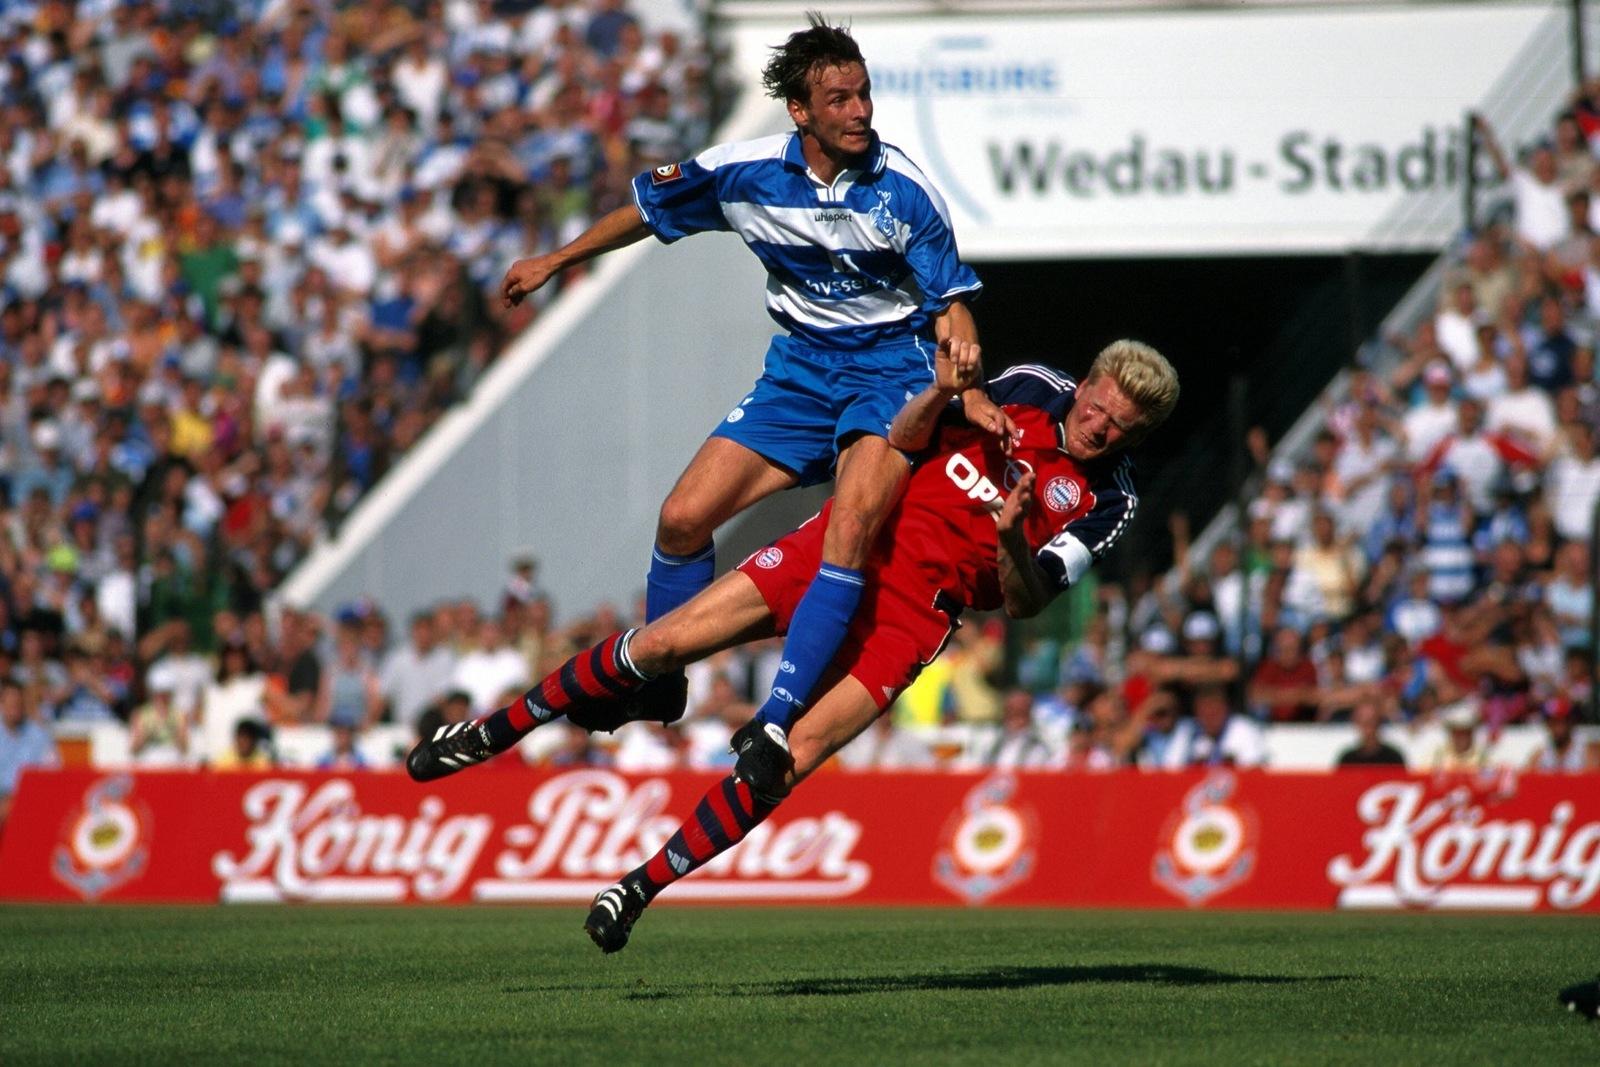 Dietmar Hirsch, MSV Duisburg, überspringt Stefan Effenberg, FC Bayern.